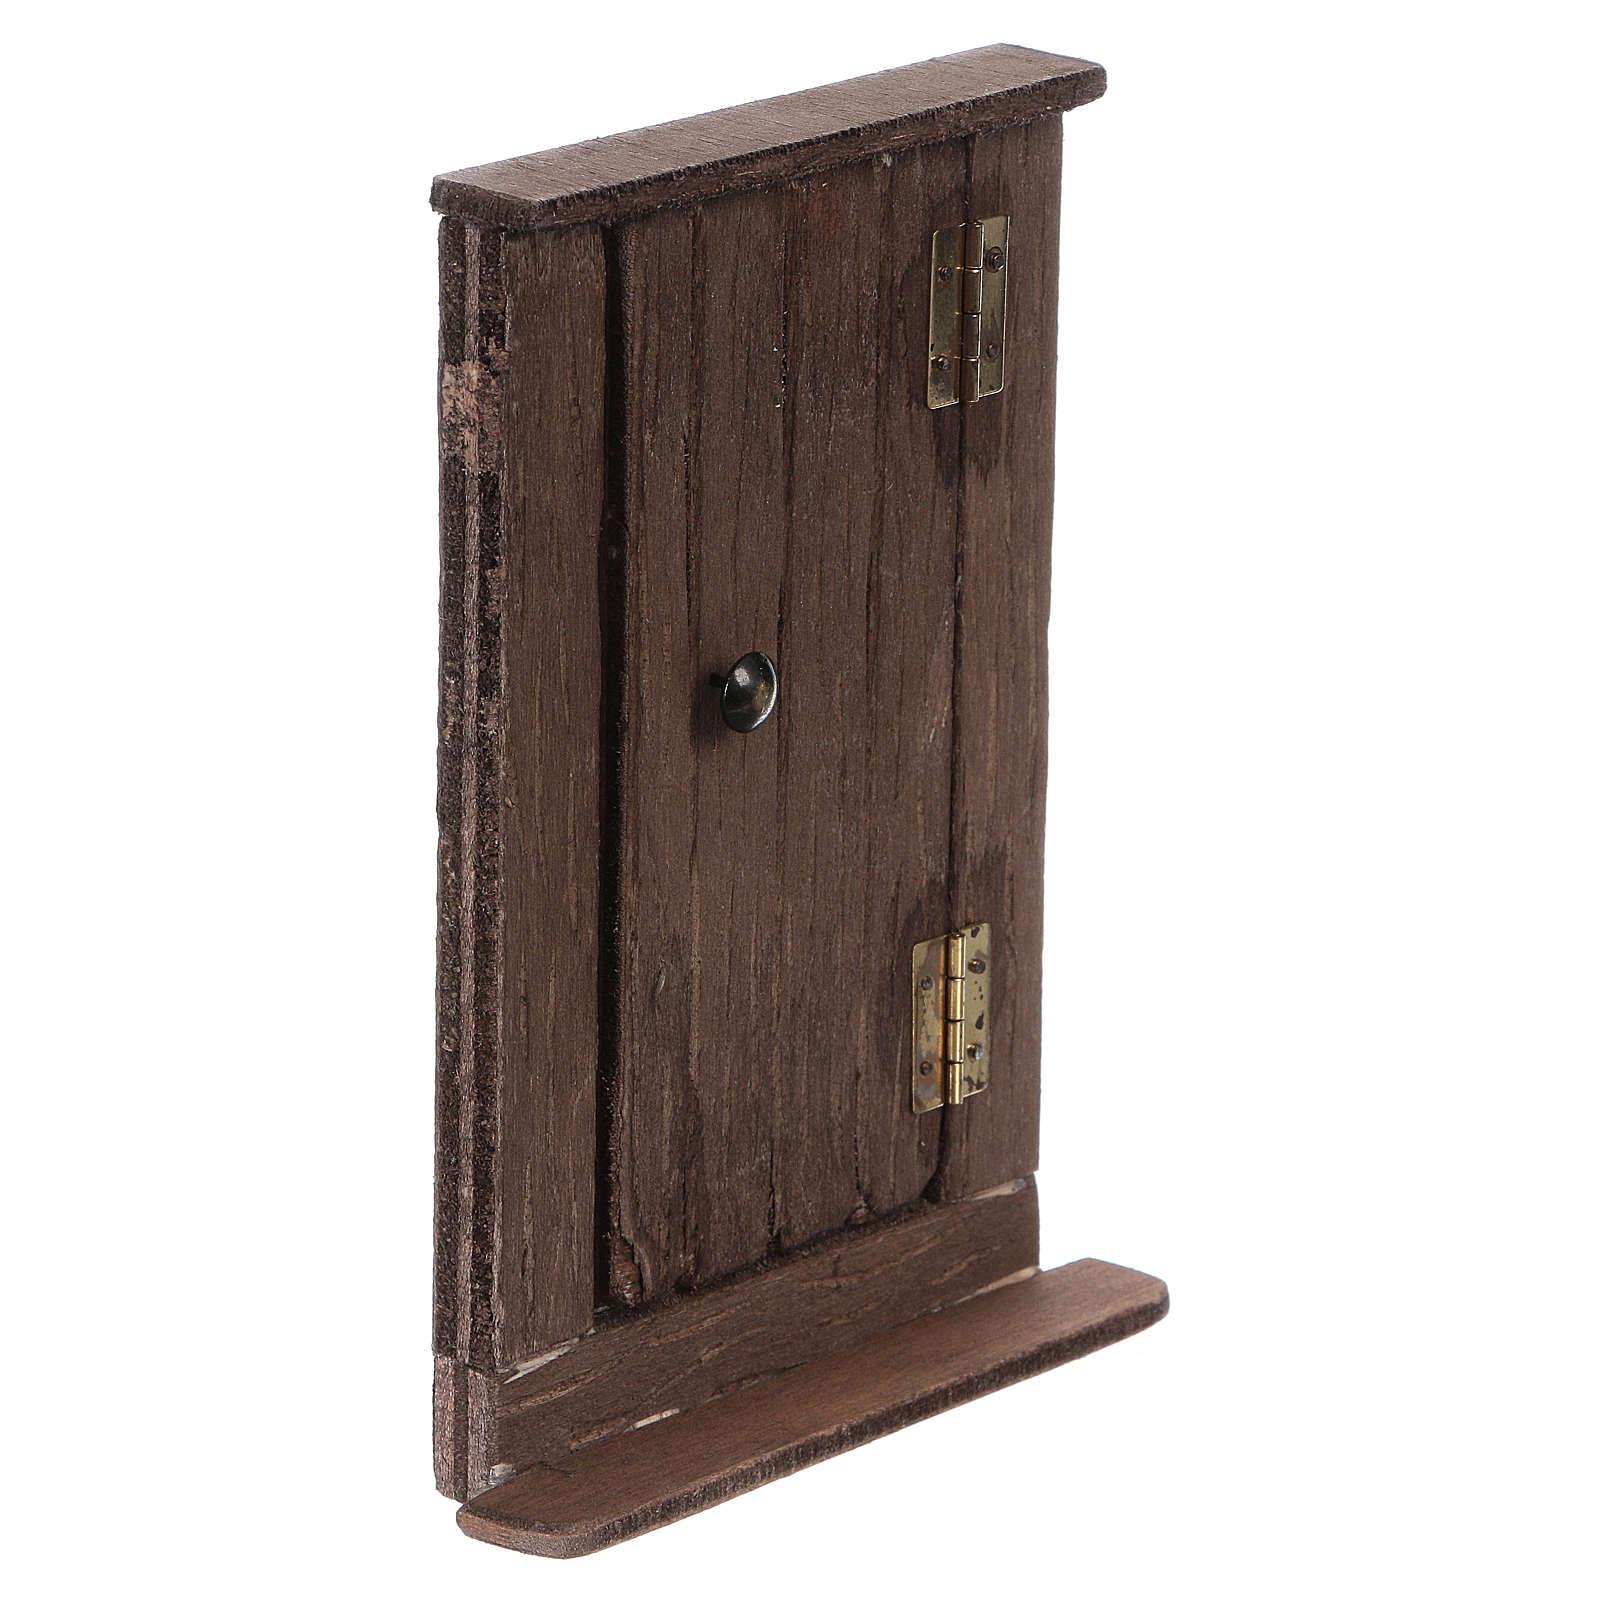 Puerta de madera h real 15 cm belén napolitano 4